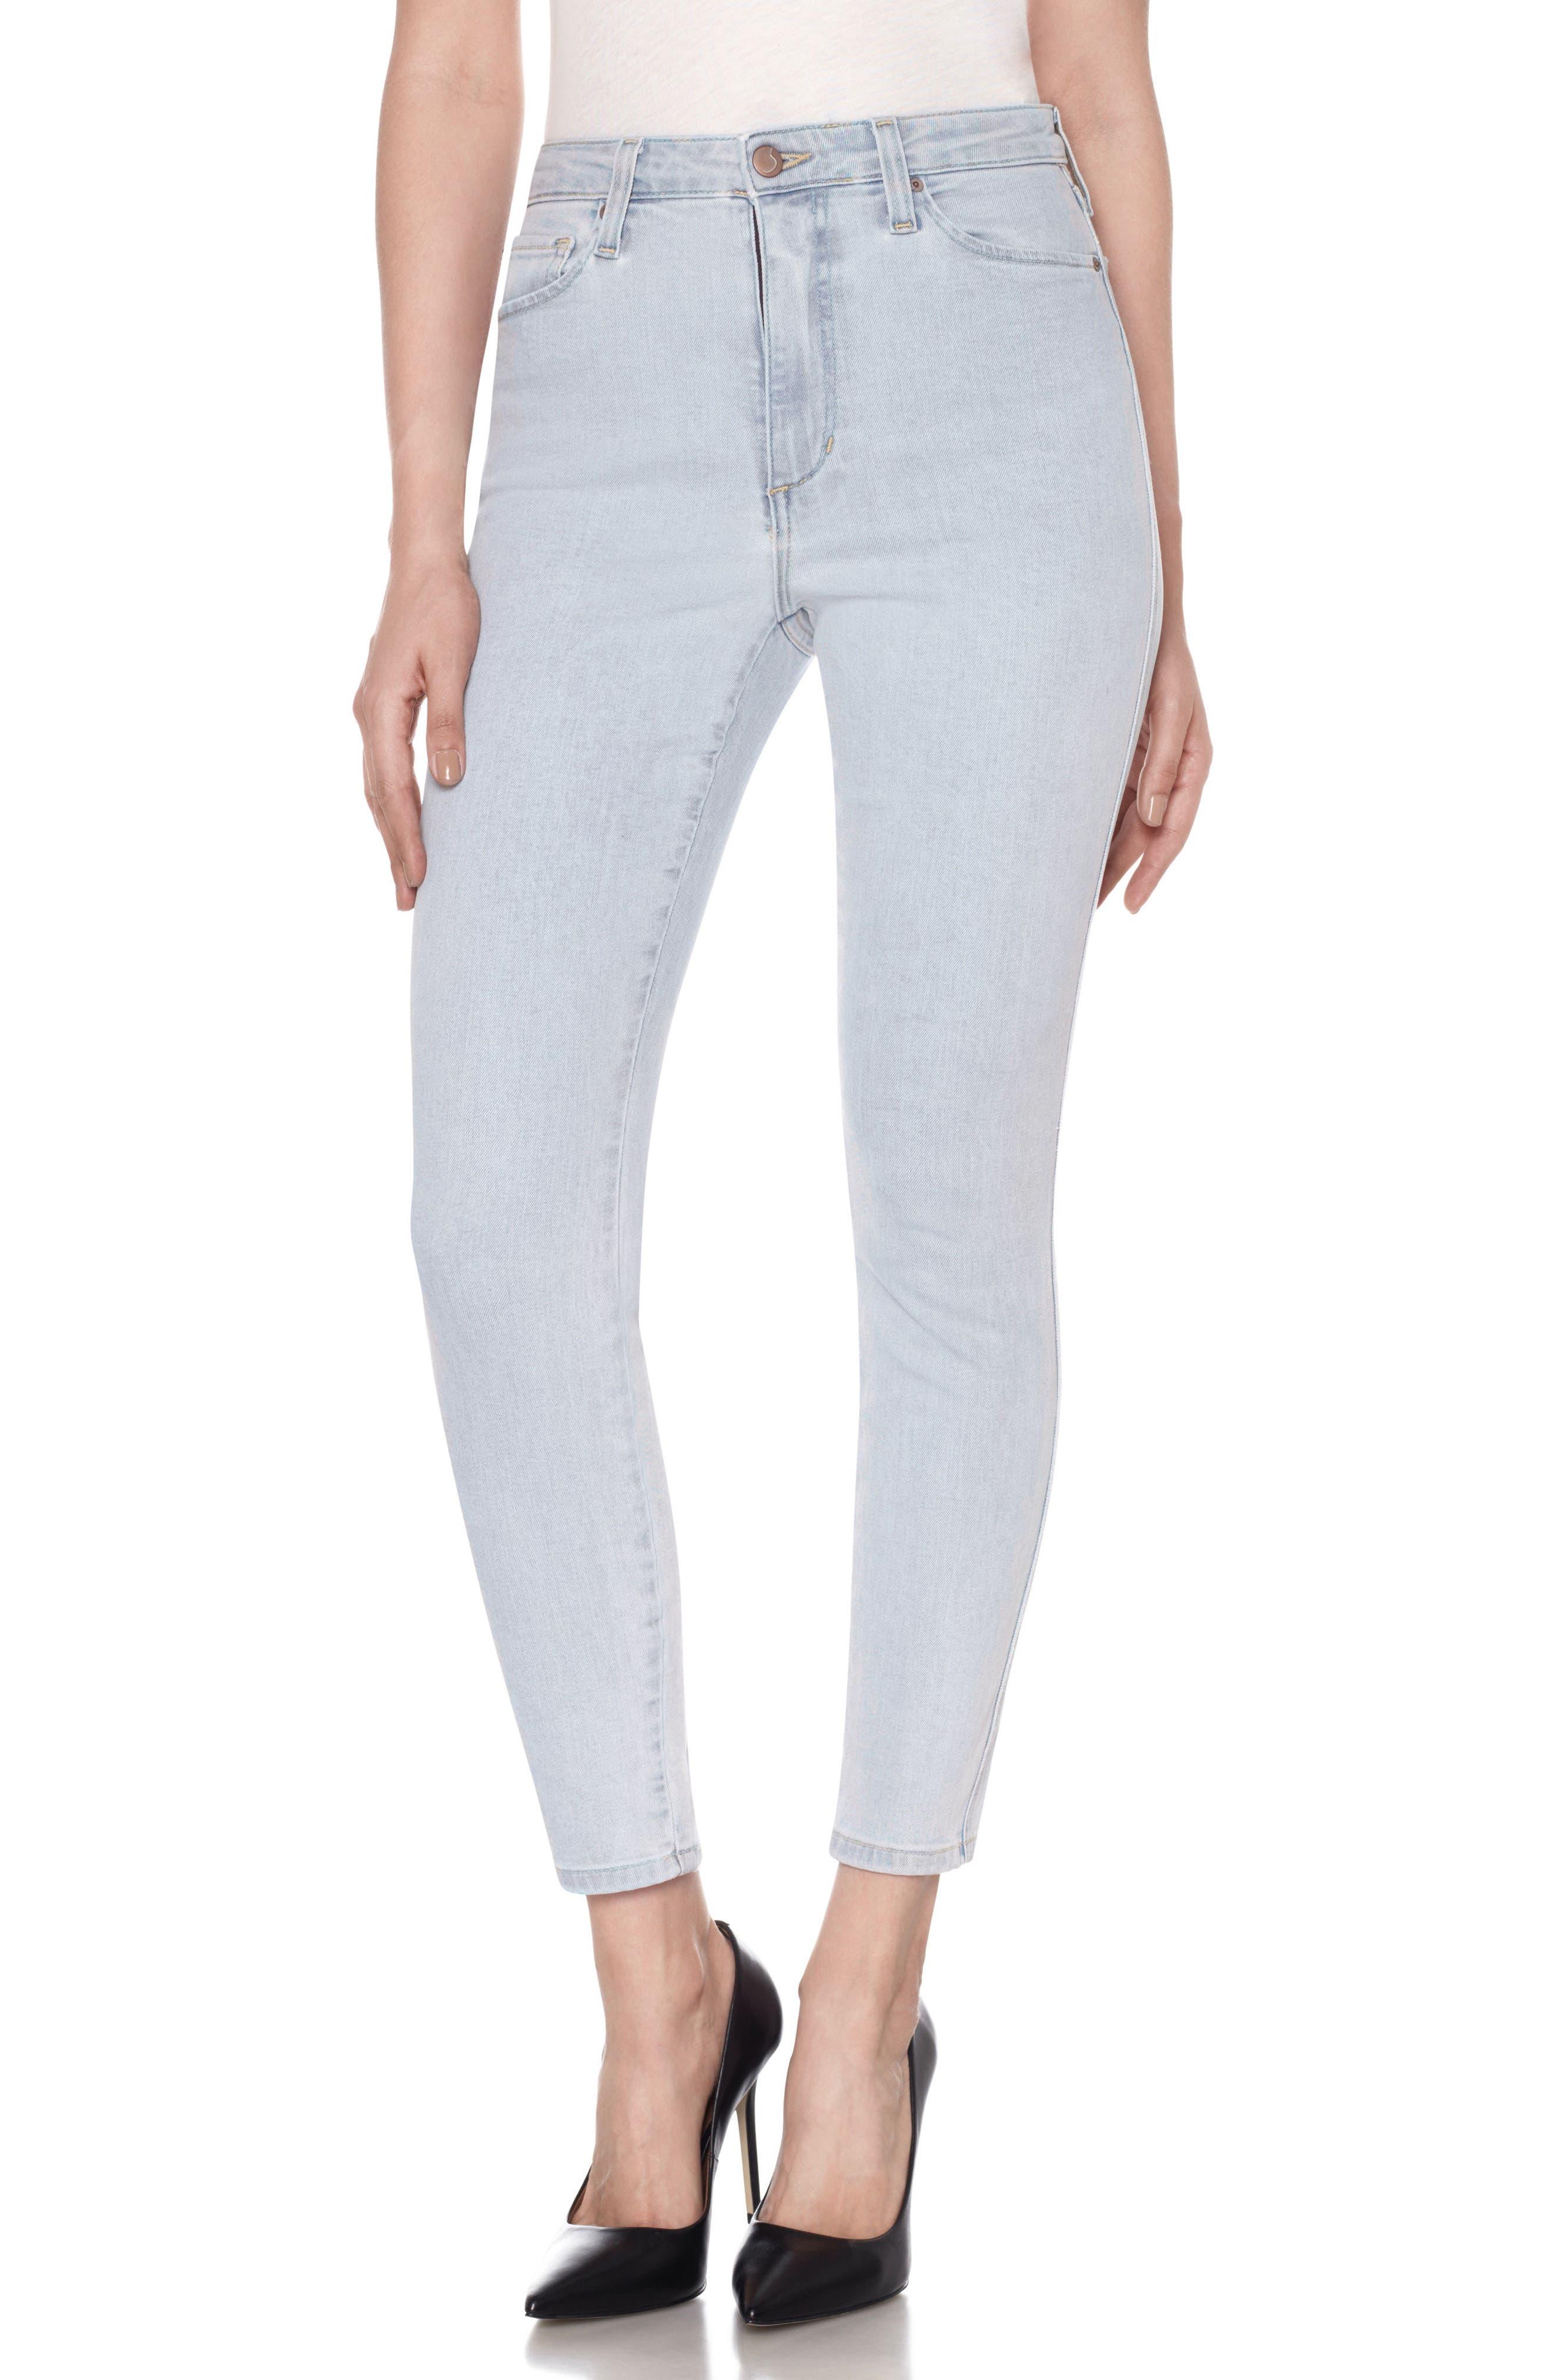 Main Image - Joe's Flawless - Bella High Waist Ankle Skinny Jeans (Amada)